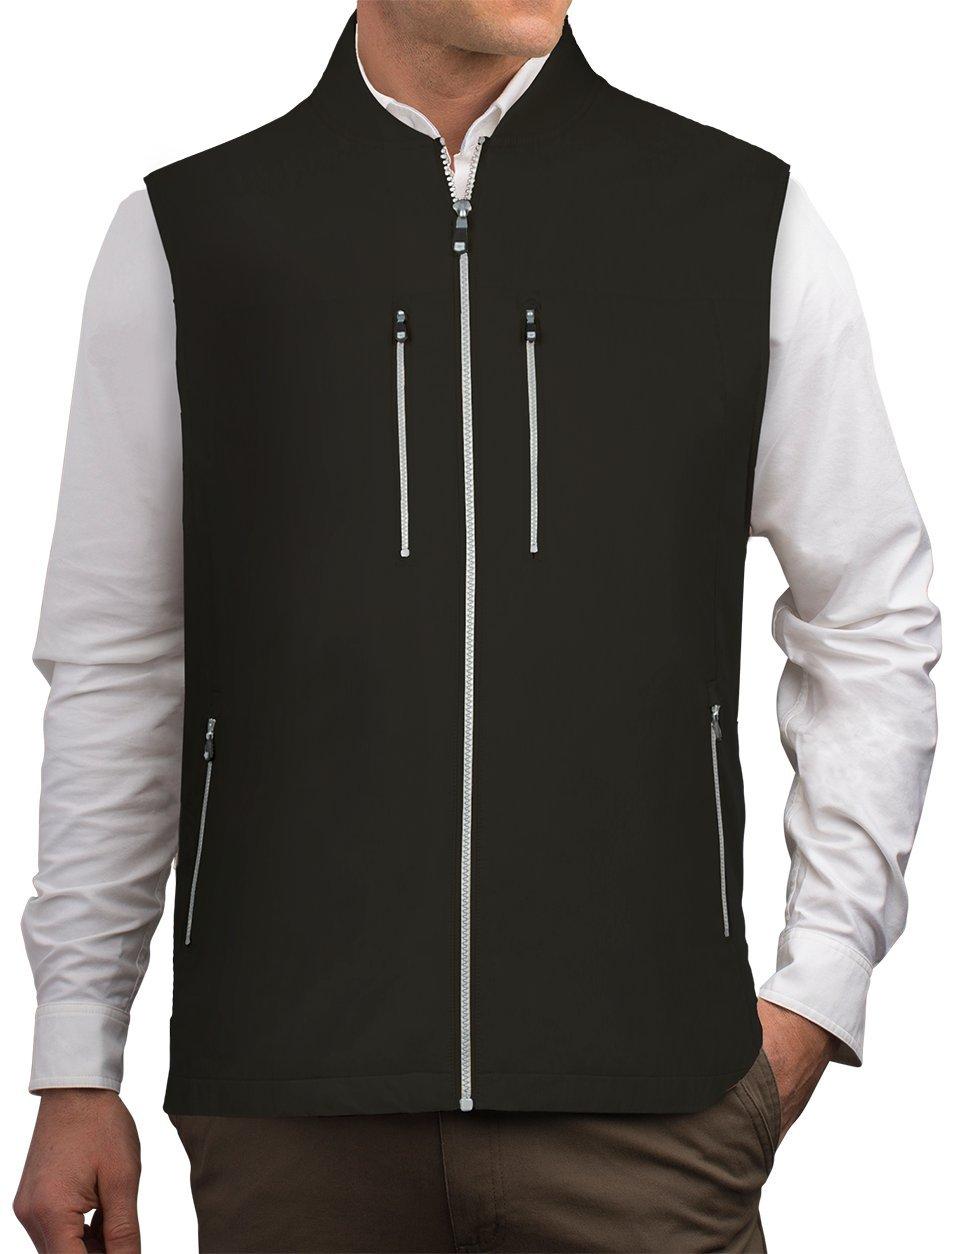 SCOTTeVEST 101 Travel Vest for Men - Hidden Pockets - Lightweight Utility Vest BLK XXXL by SCOTTeVEST